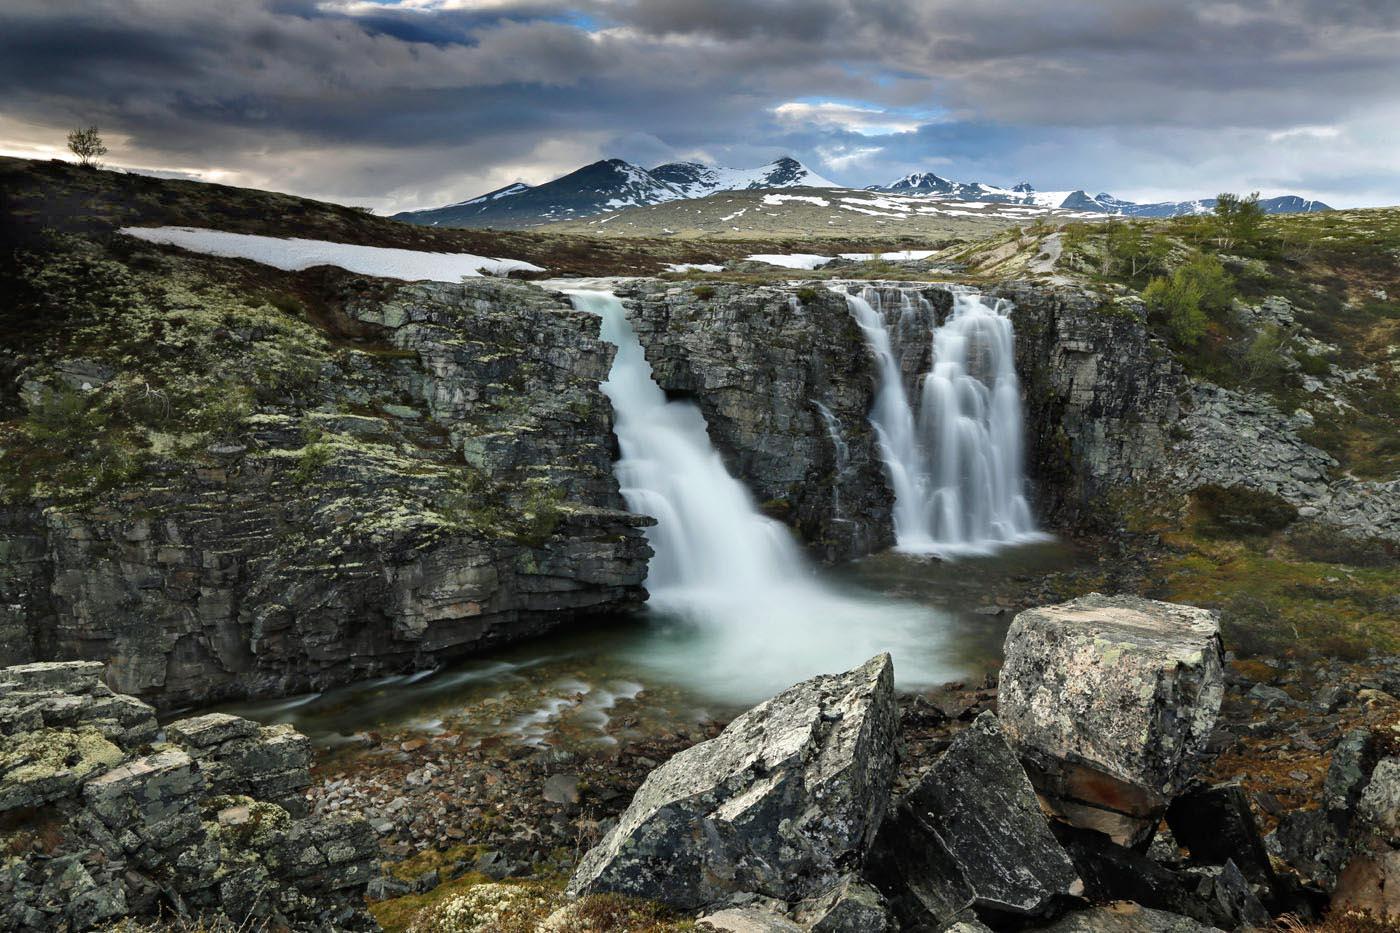 Turen i år går til Rondane